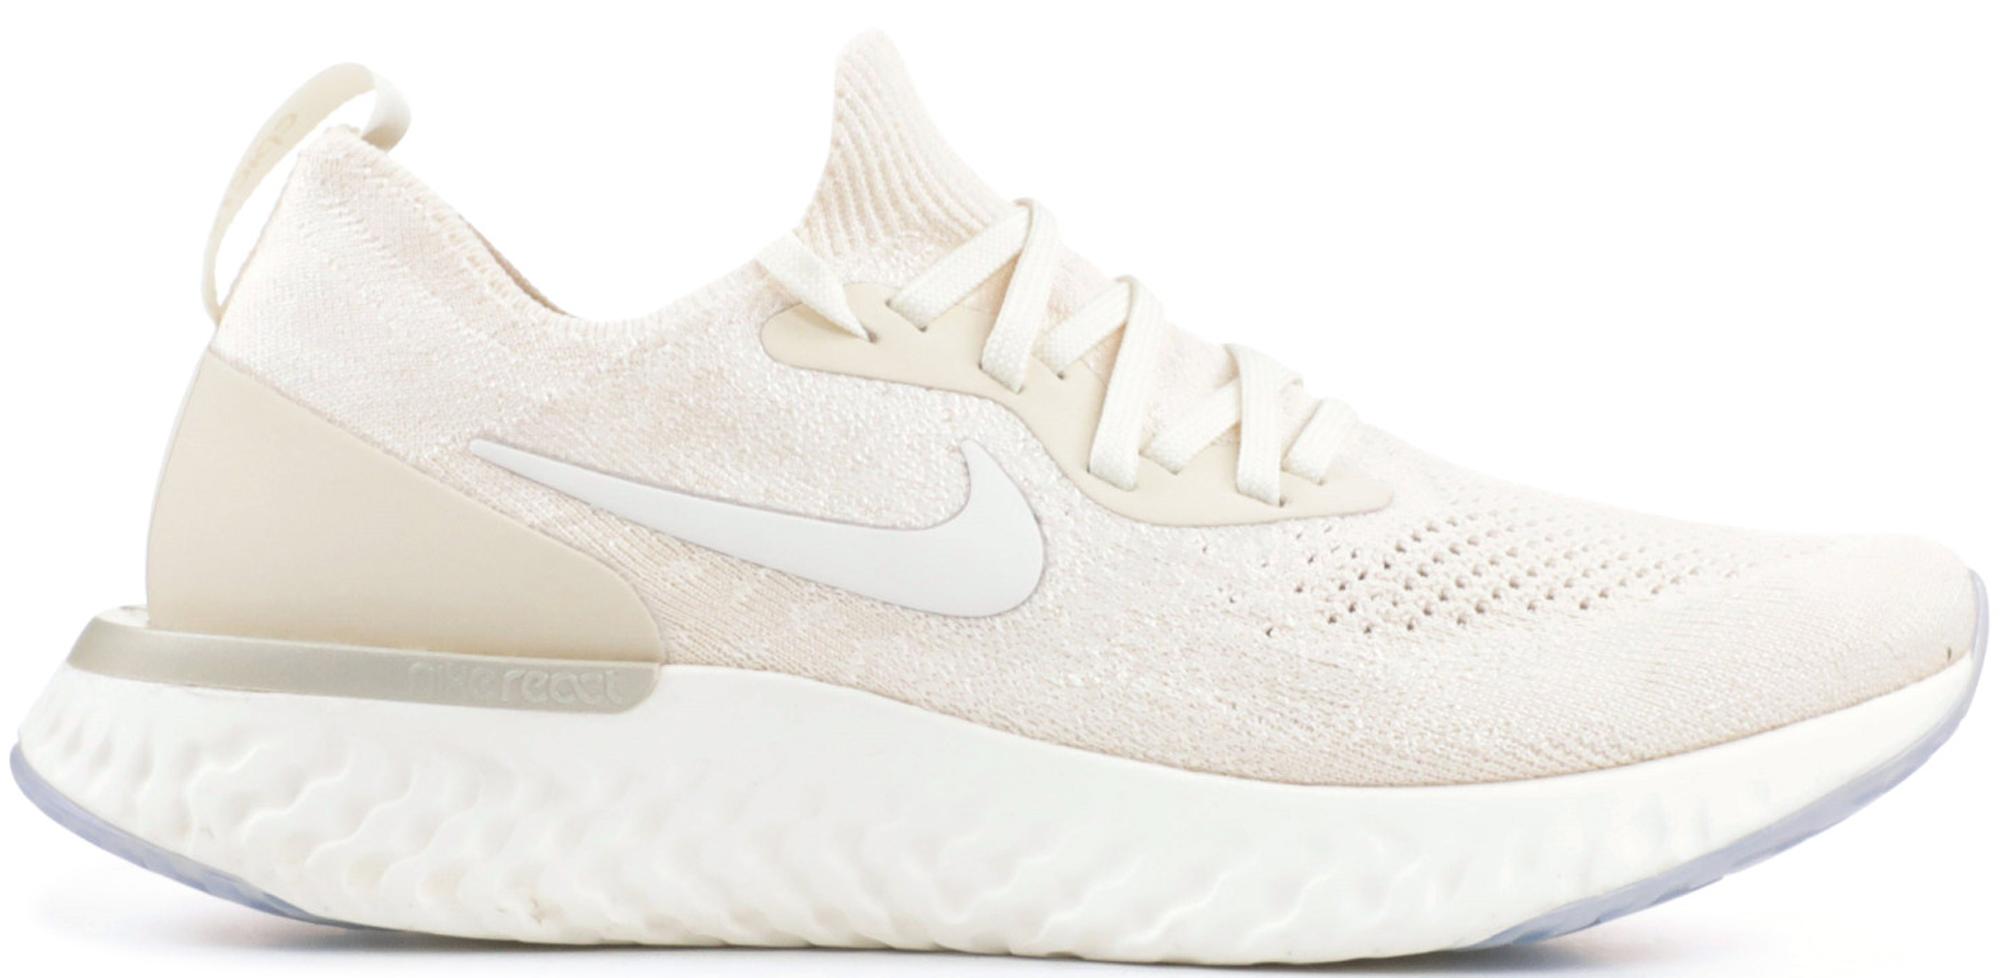 Nike Epic React Flyknit Light Cream (W